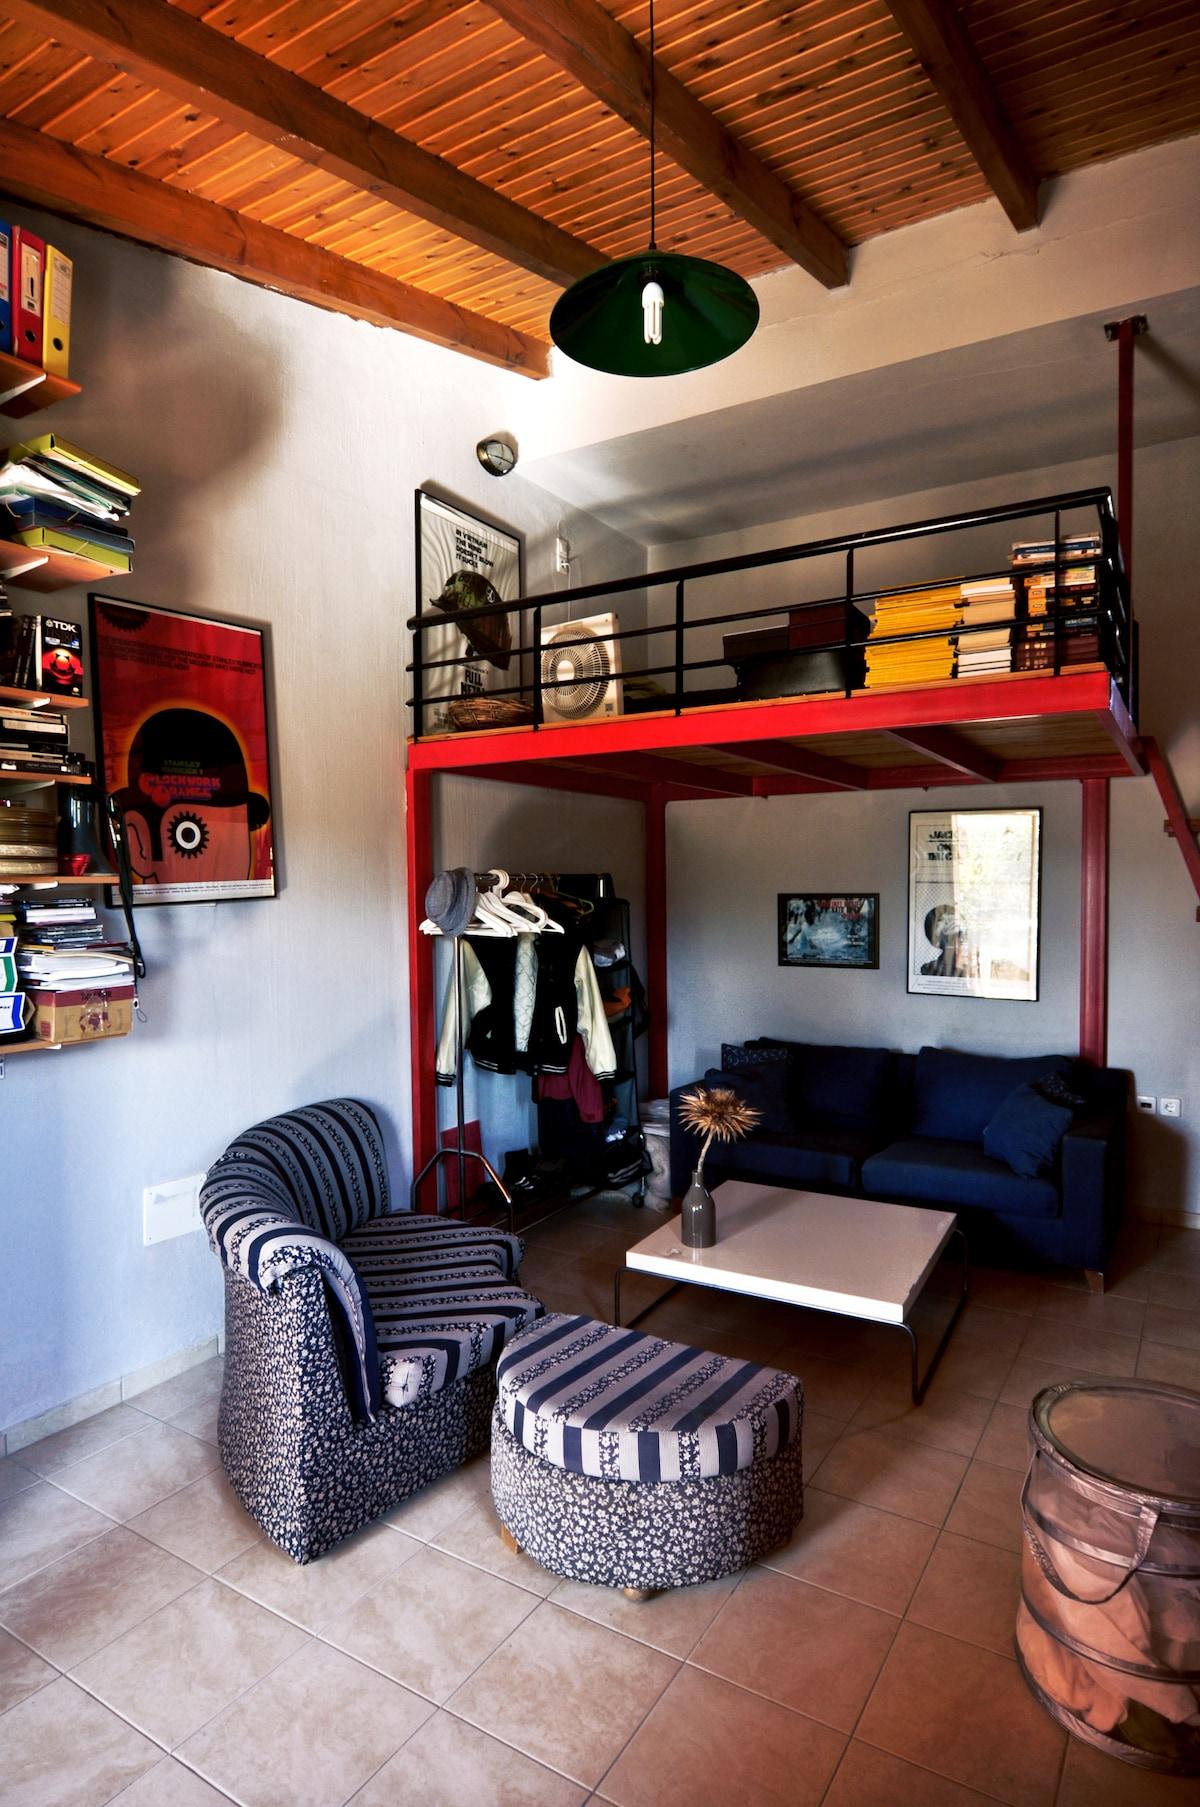 Great studio in Crete free pick up!